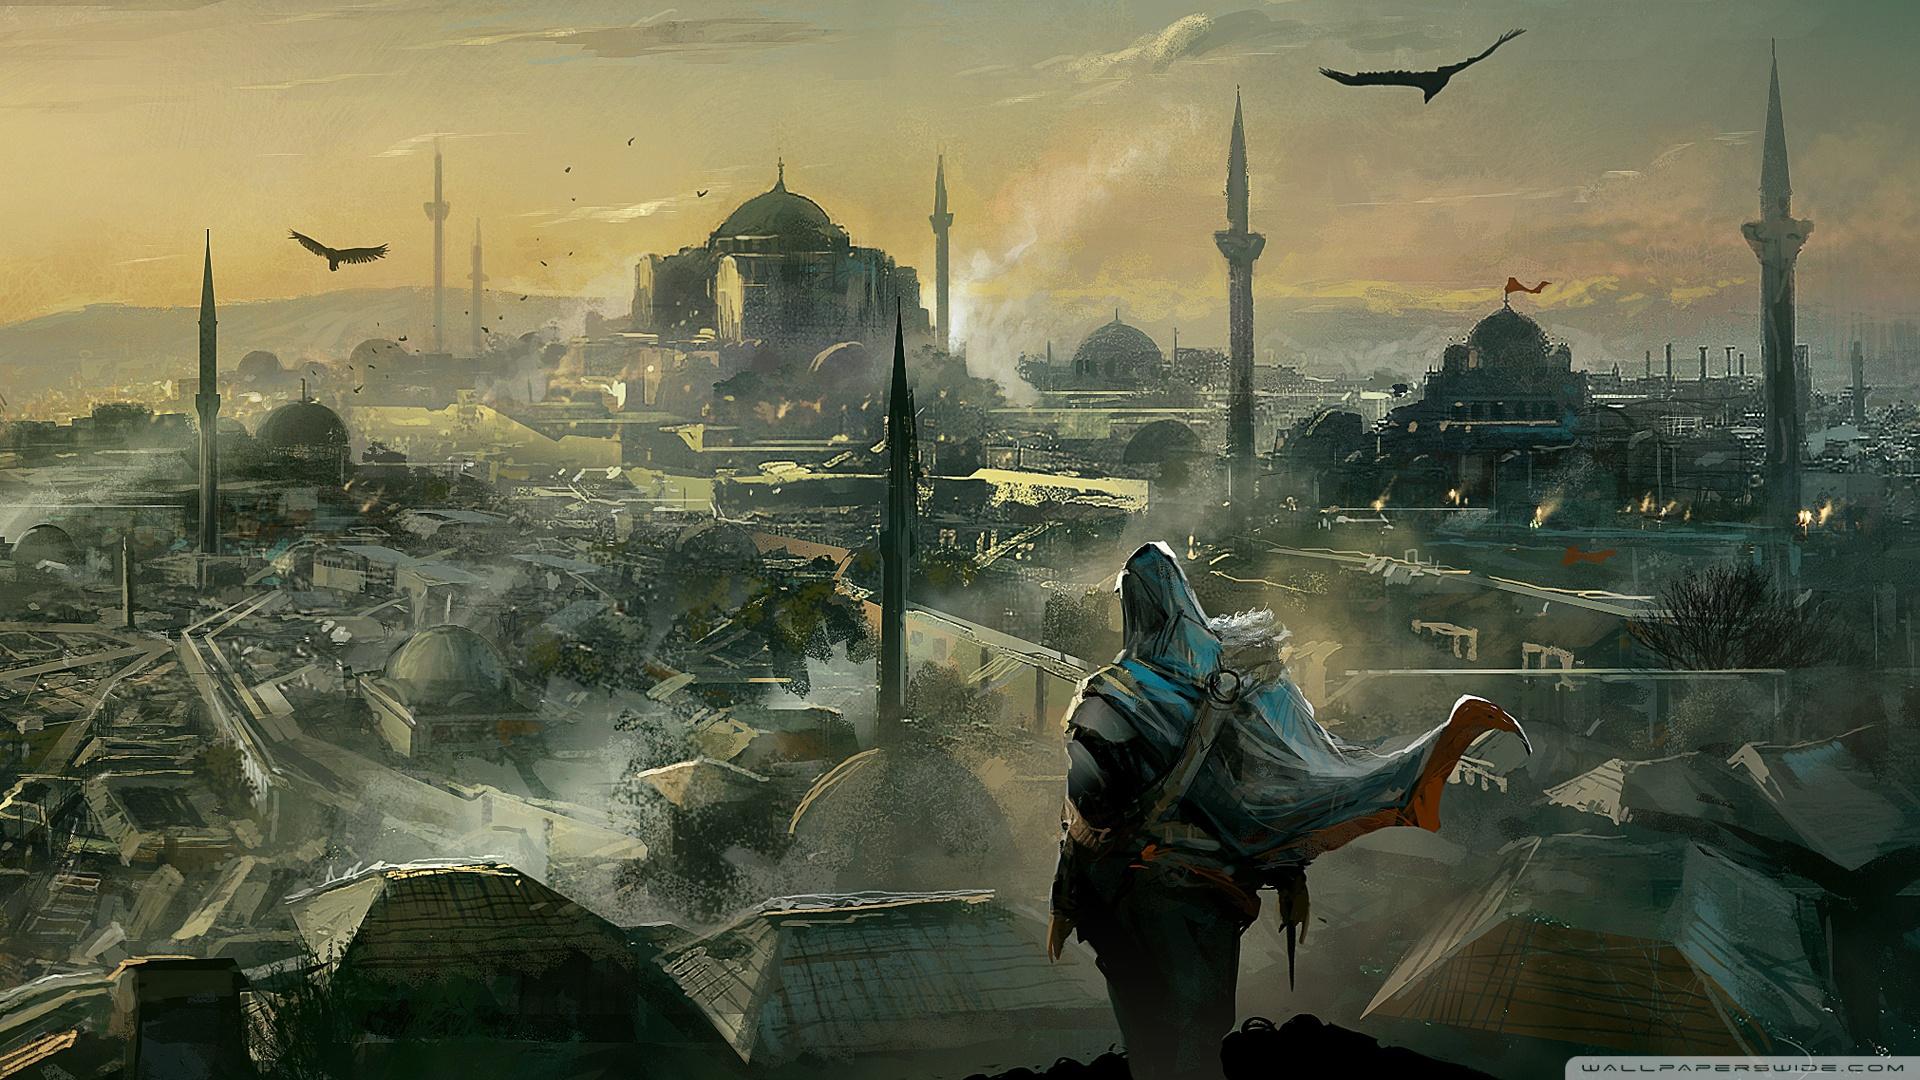 Free Download Assassins Creed Revelations Ezio Wallpaper 1920x1080